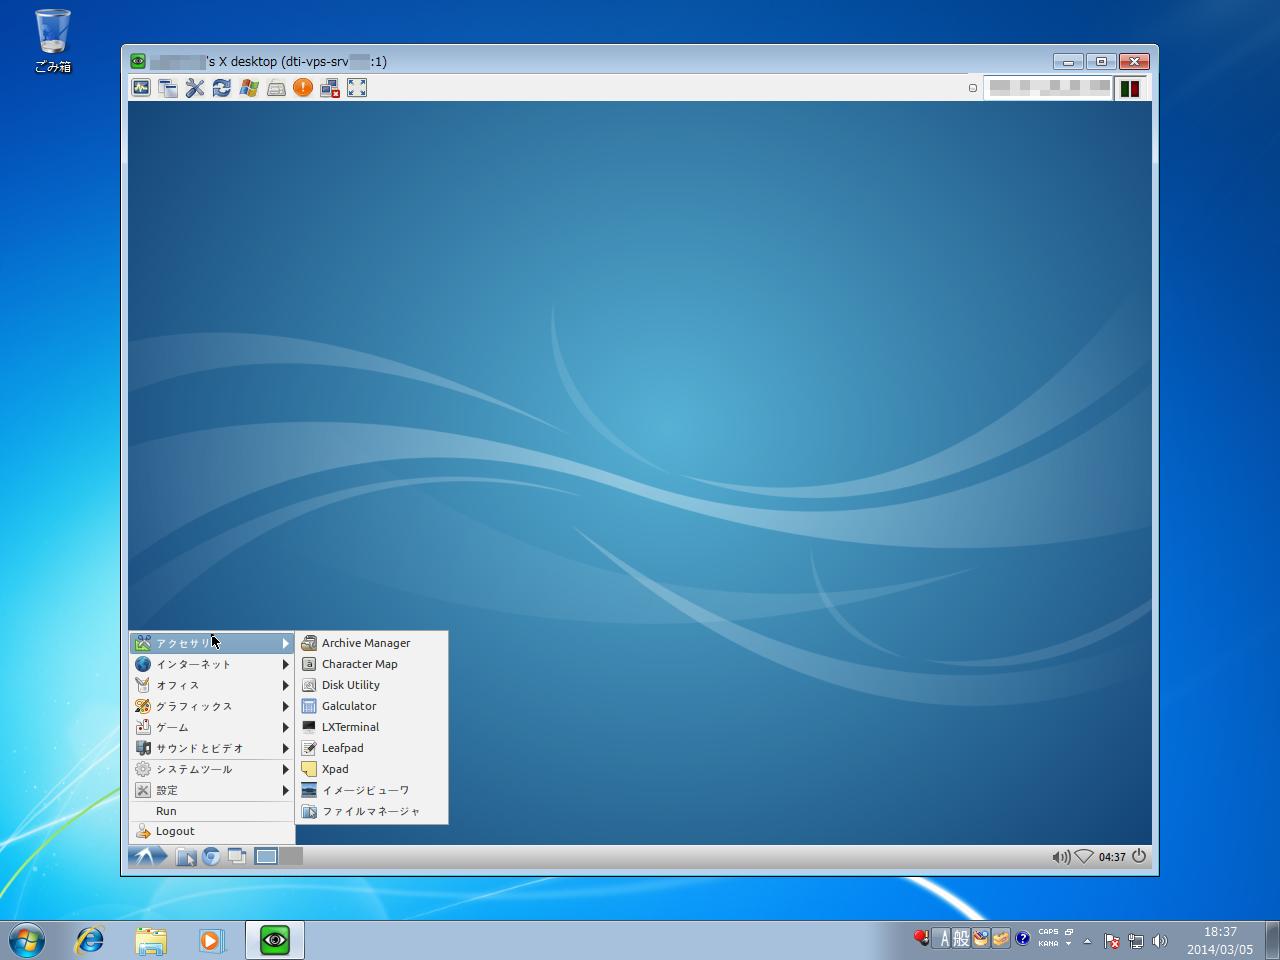 Windowsで動くUltraVNCで、サーバー上のデスクトップ画面が表示された